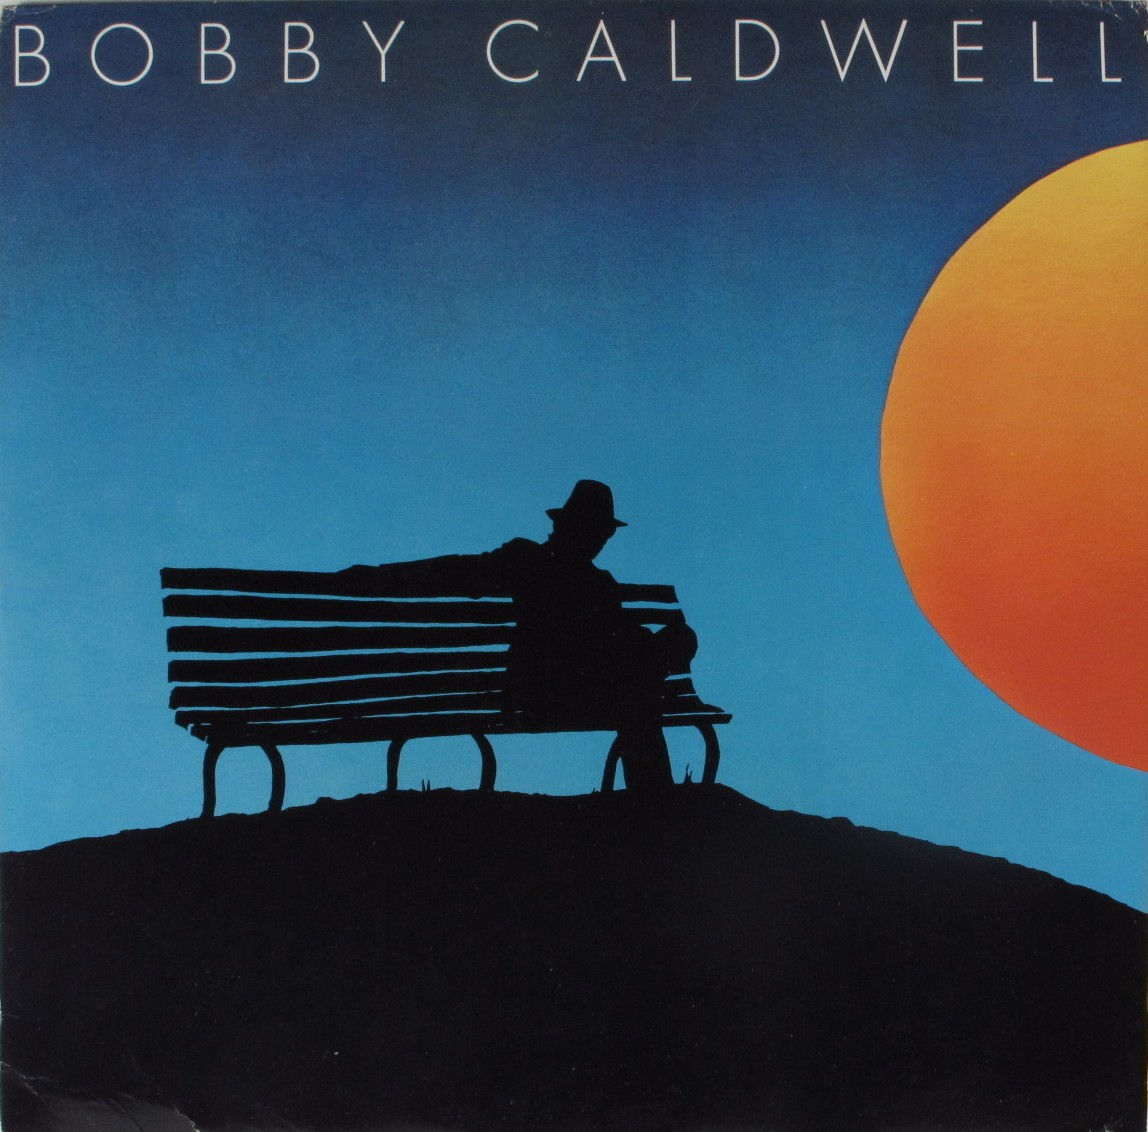 Bobby Caldwell - 1978 - Bobby Caldwell Free Download | Funk